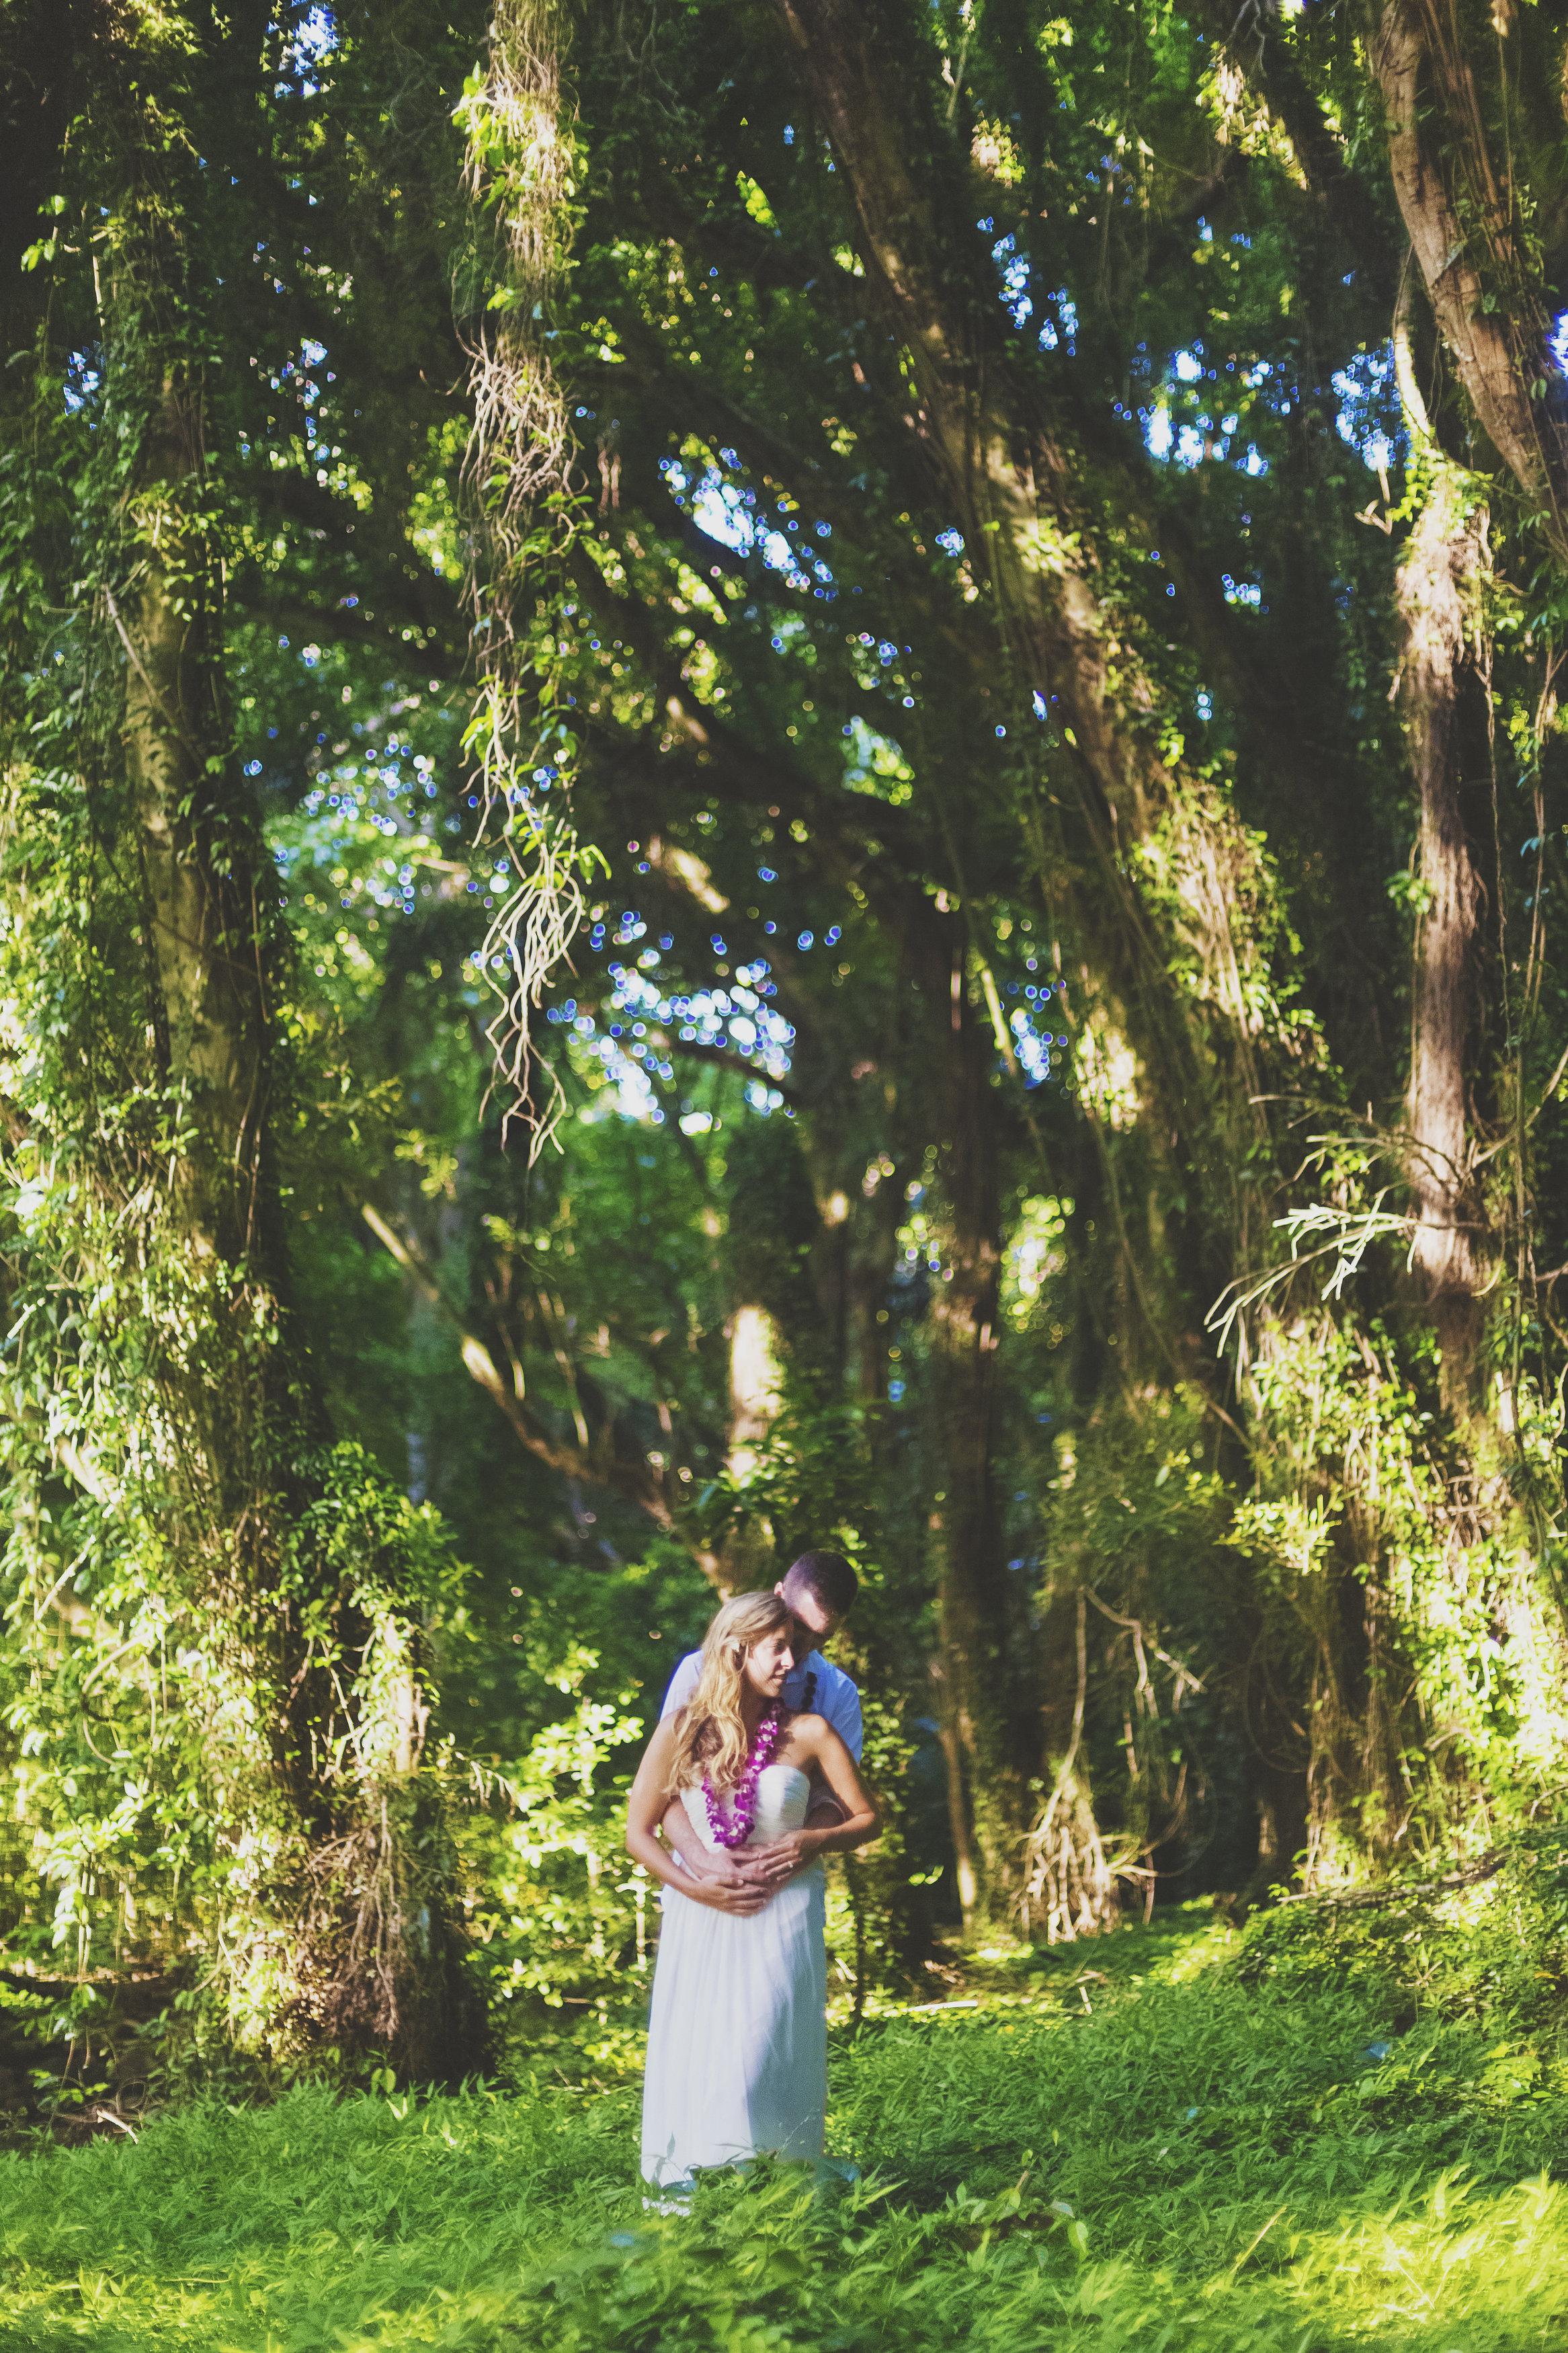 angie-diaz-photography-maui-honeymoon-hawaii-elopement-26.jpg